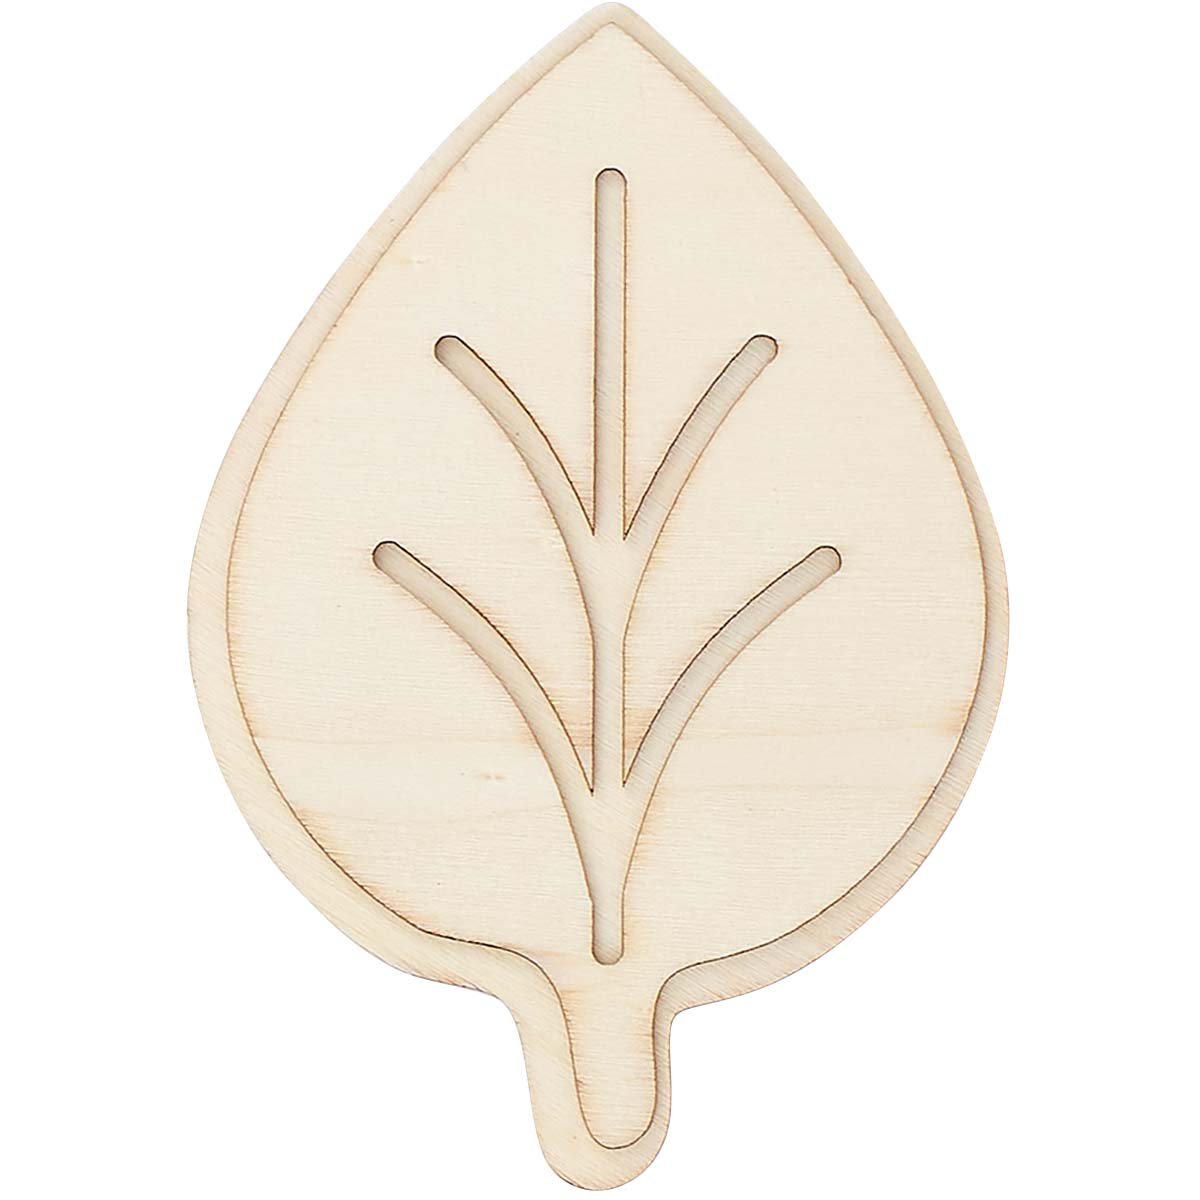 Plaid ® Wood Surfaces - Unpainted Layered Shapes - Leaf - 44967